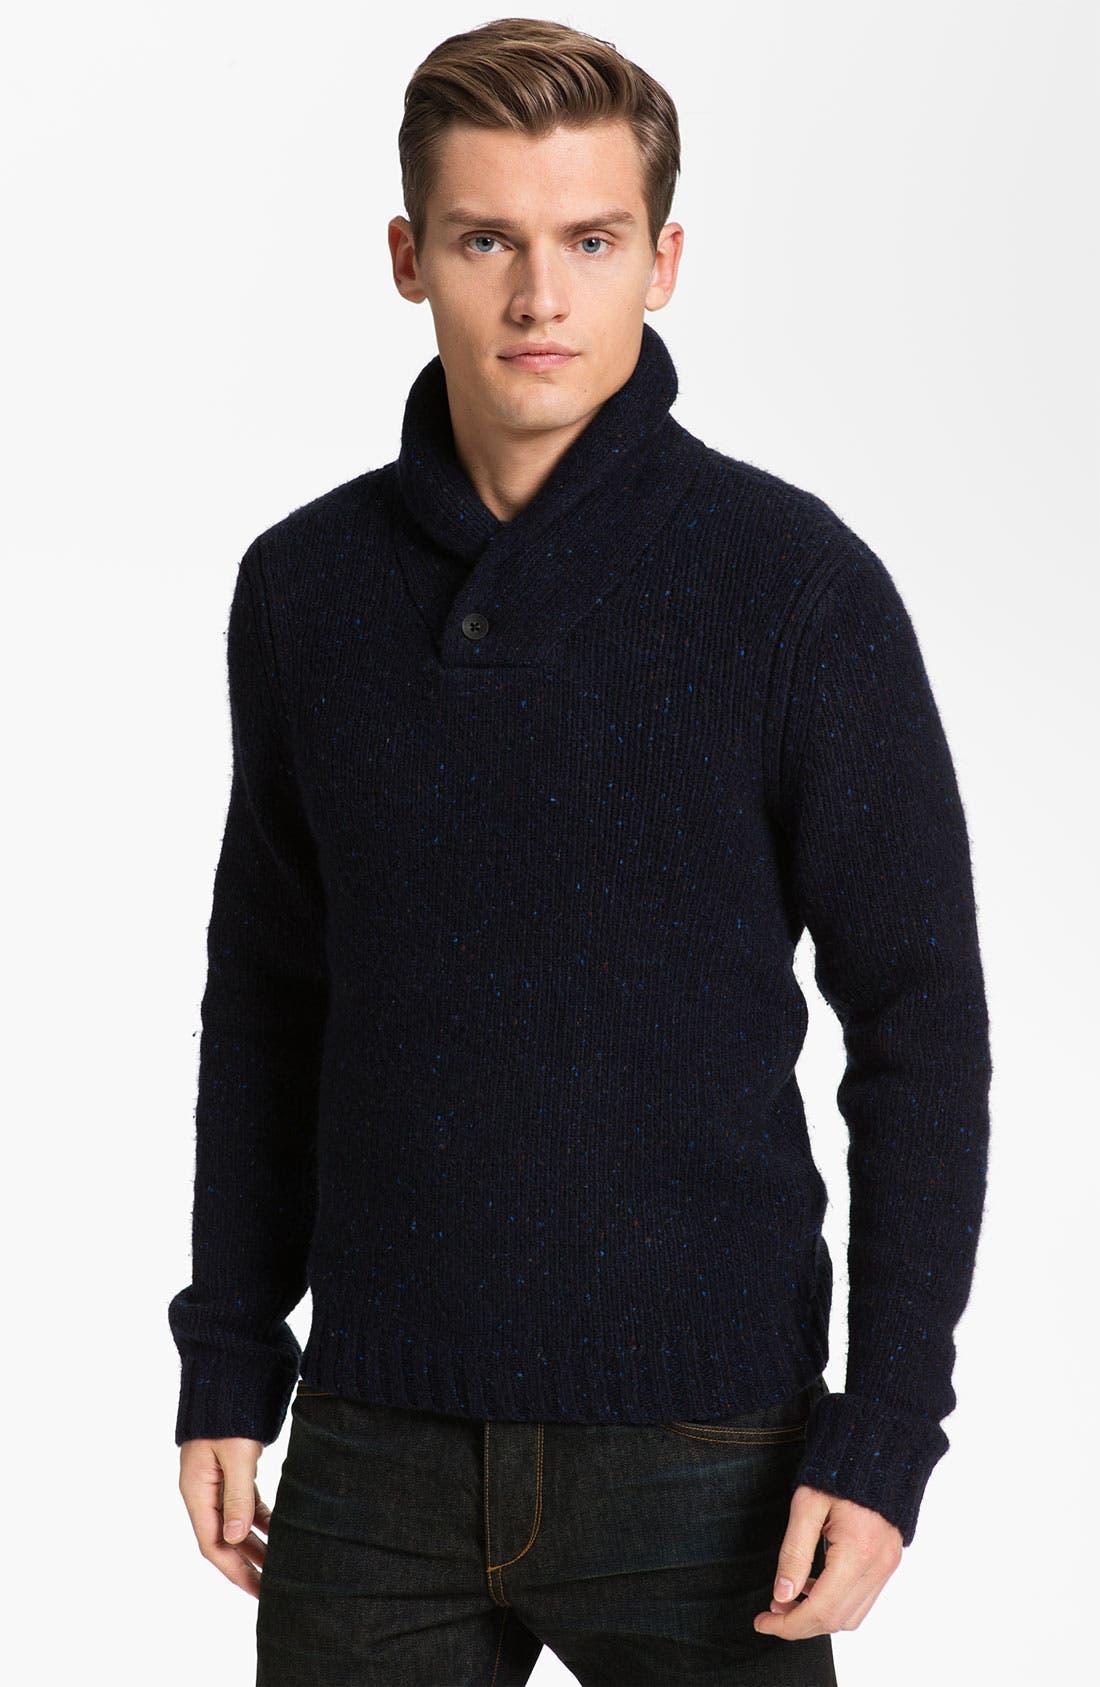 Main Image - rag & bone 'Vail' Donegal Knit Shawl Collar Sweater